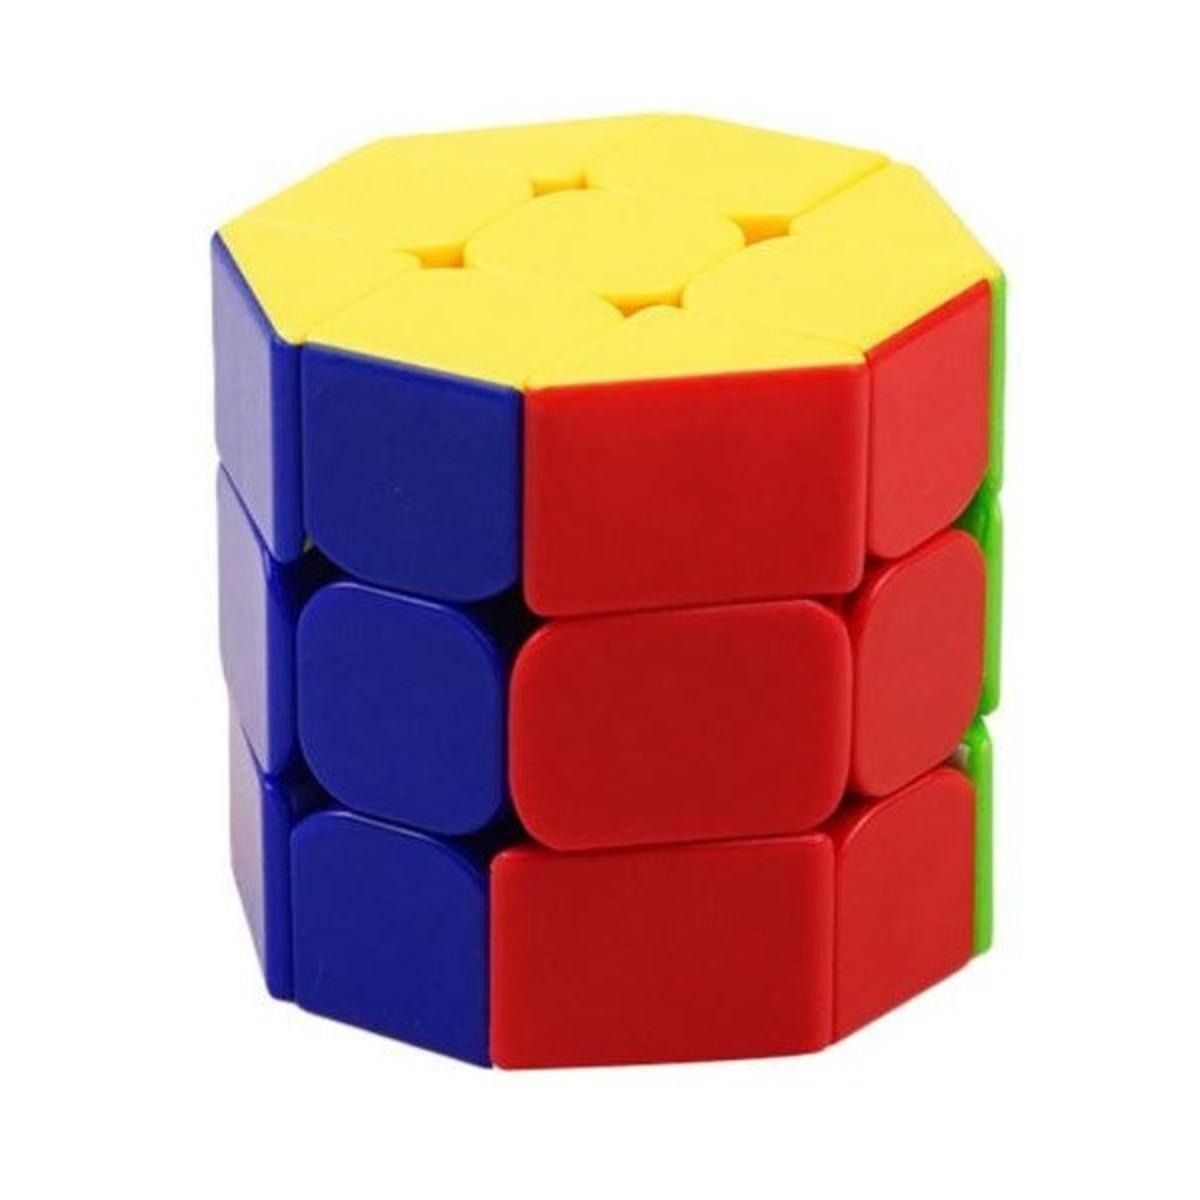 3x3x3 Barrel Z-cube